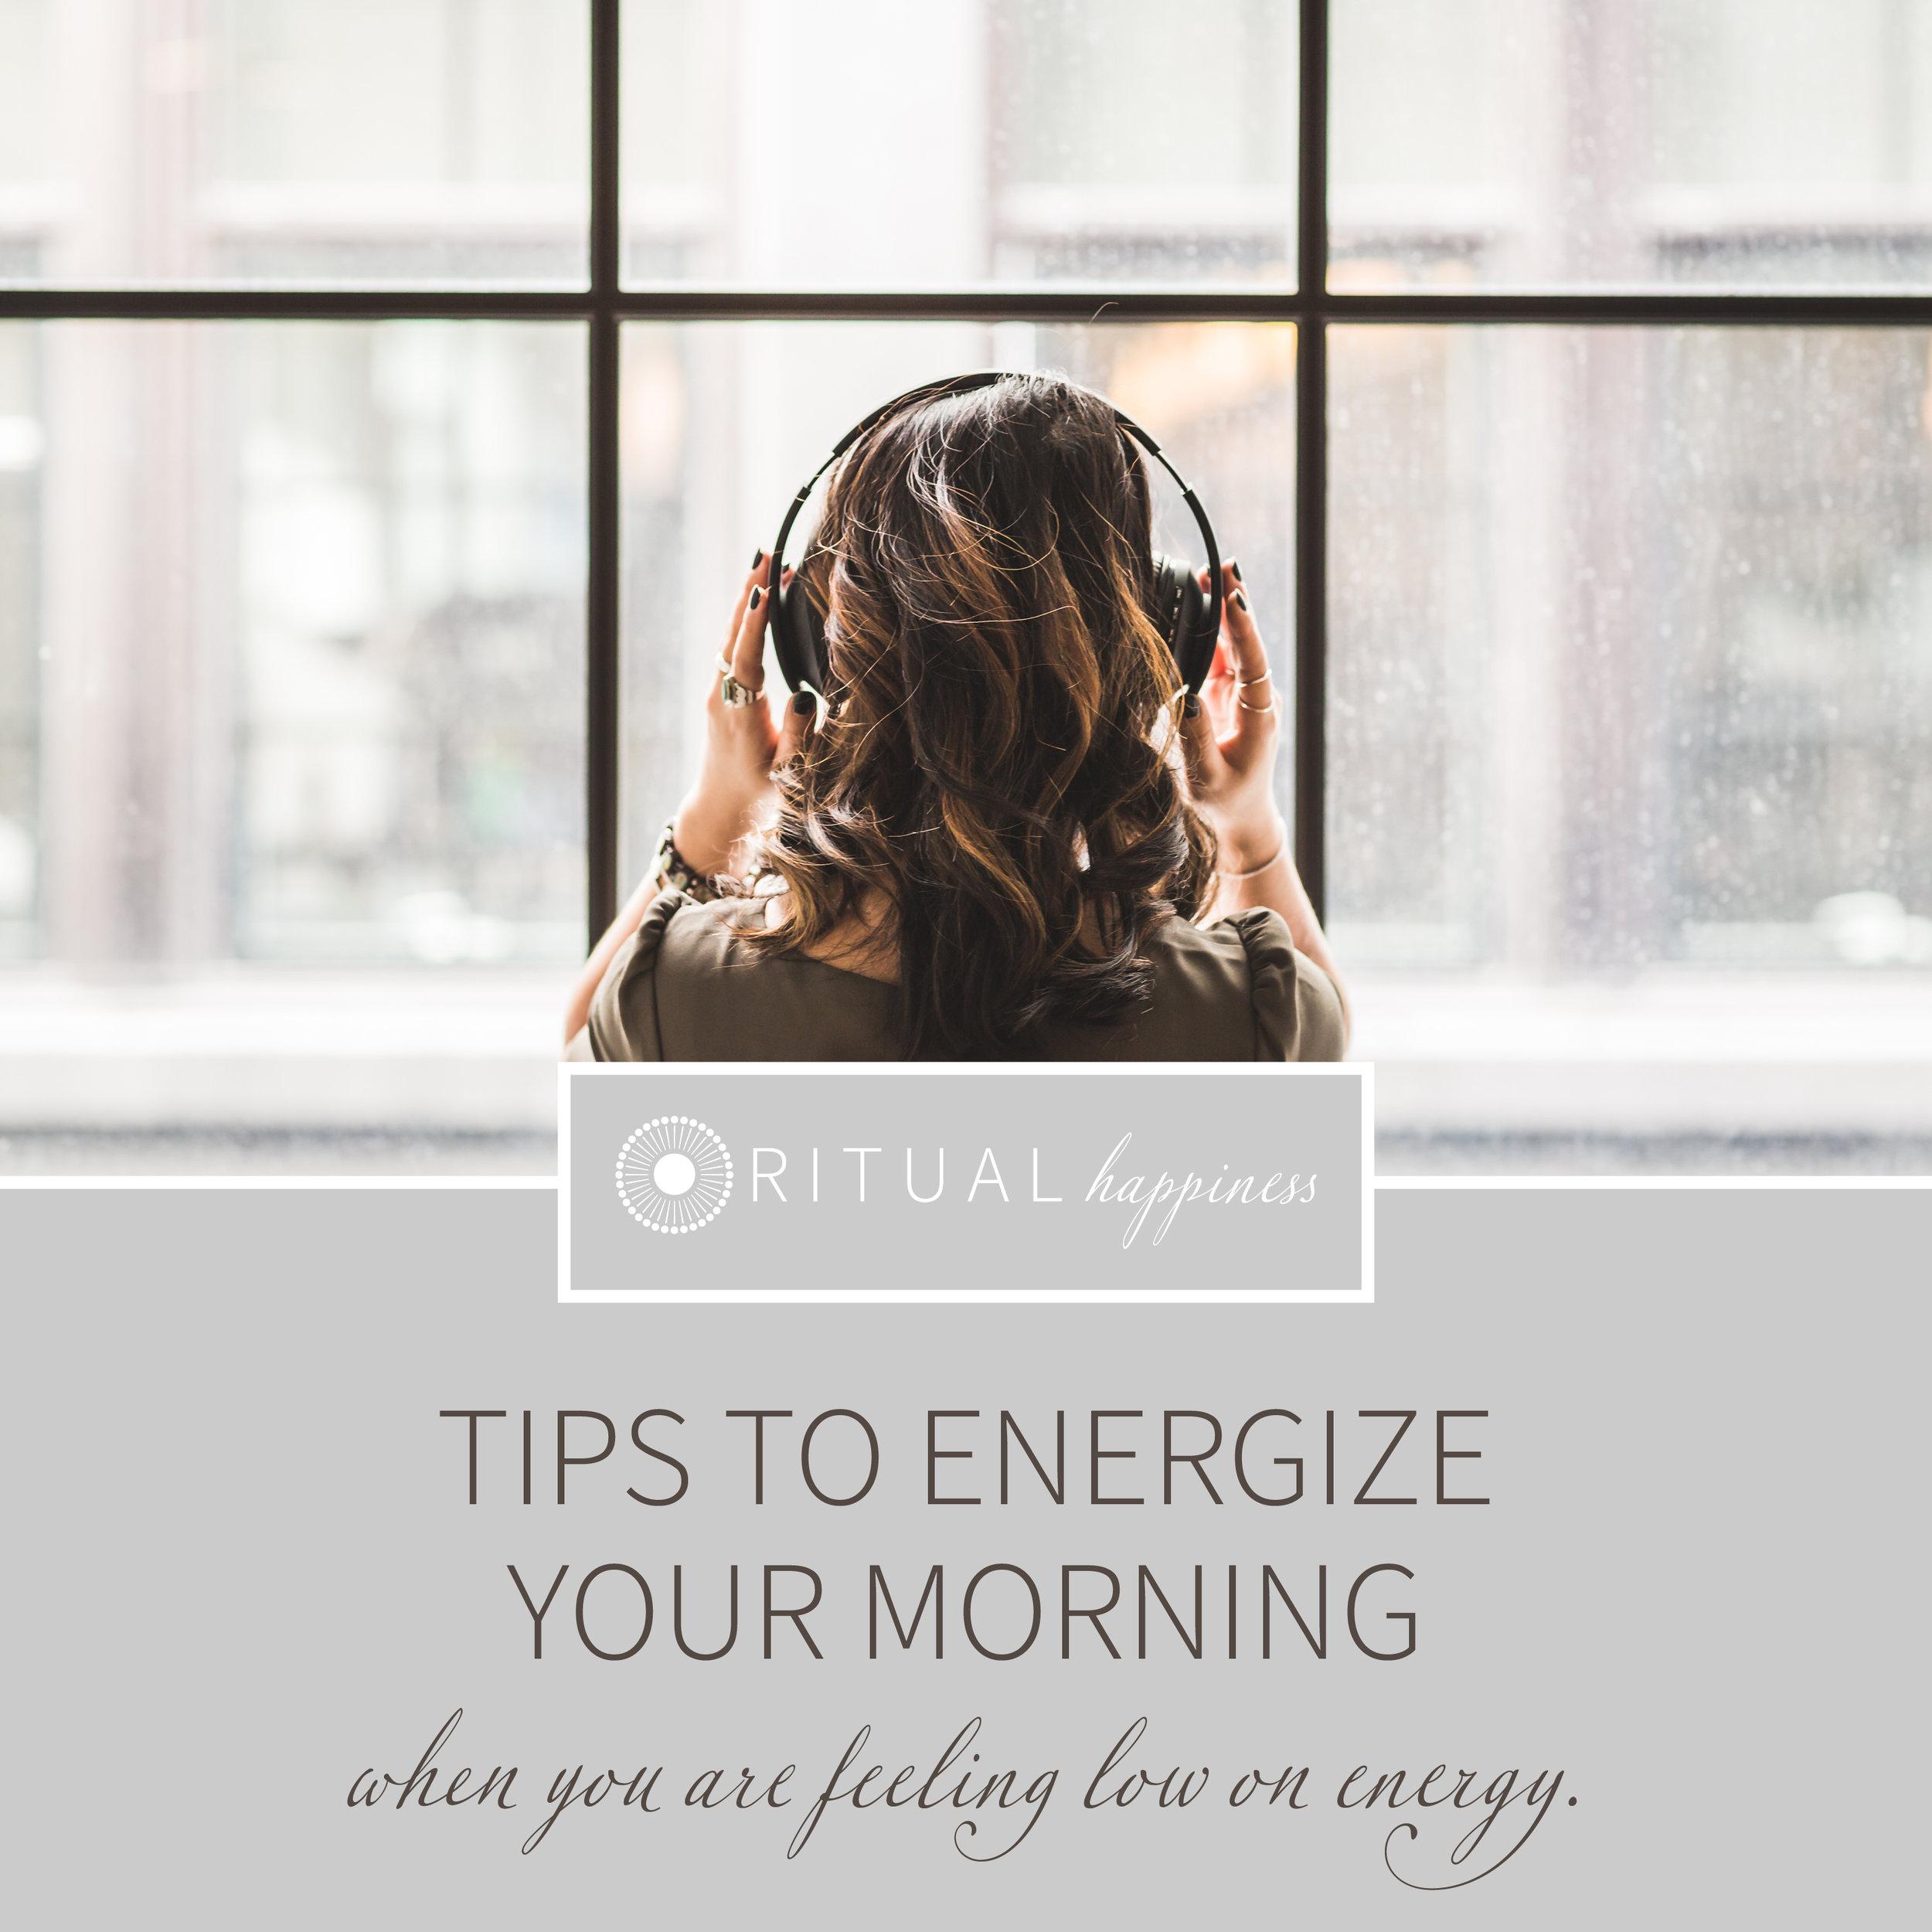 Tips_EnergizeMorning_LowEnergy.jpg